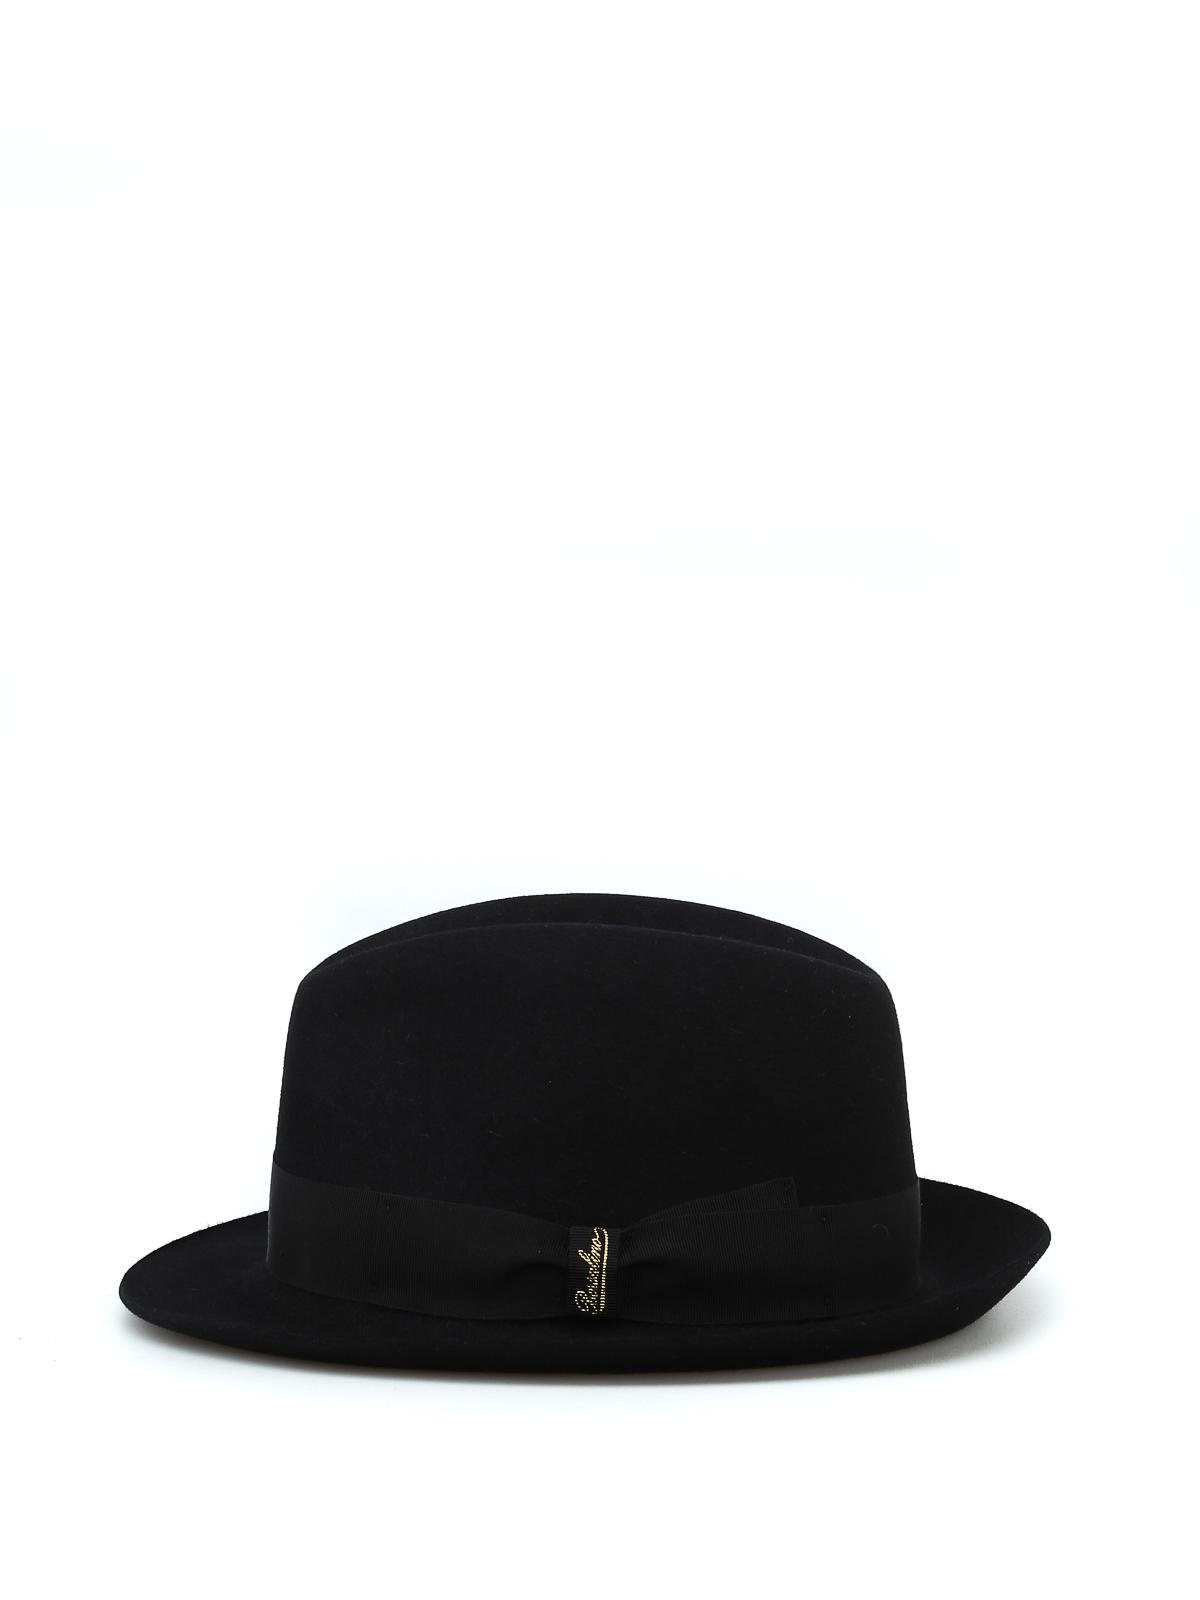 Borsalino - Sombrero - Negro - Sombreros - 1602220421 c15efa81e85